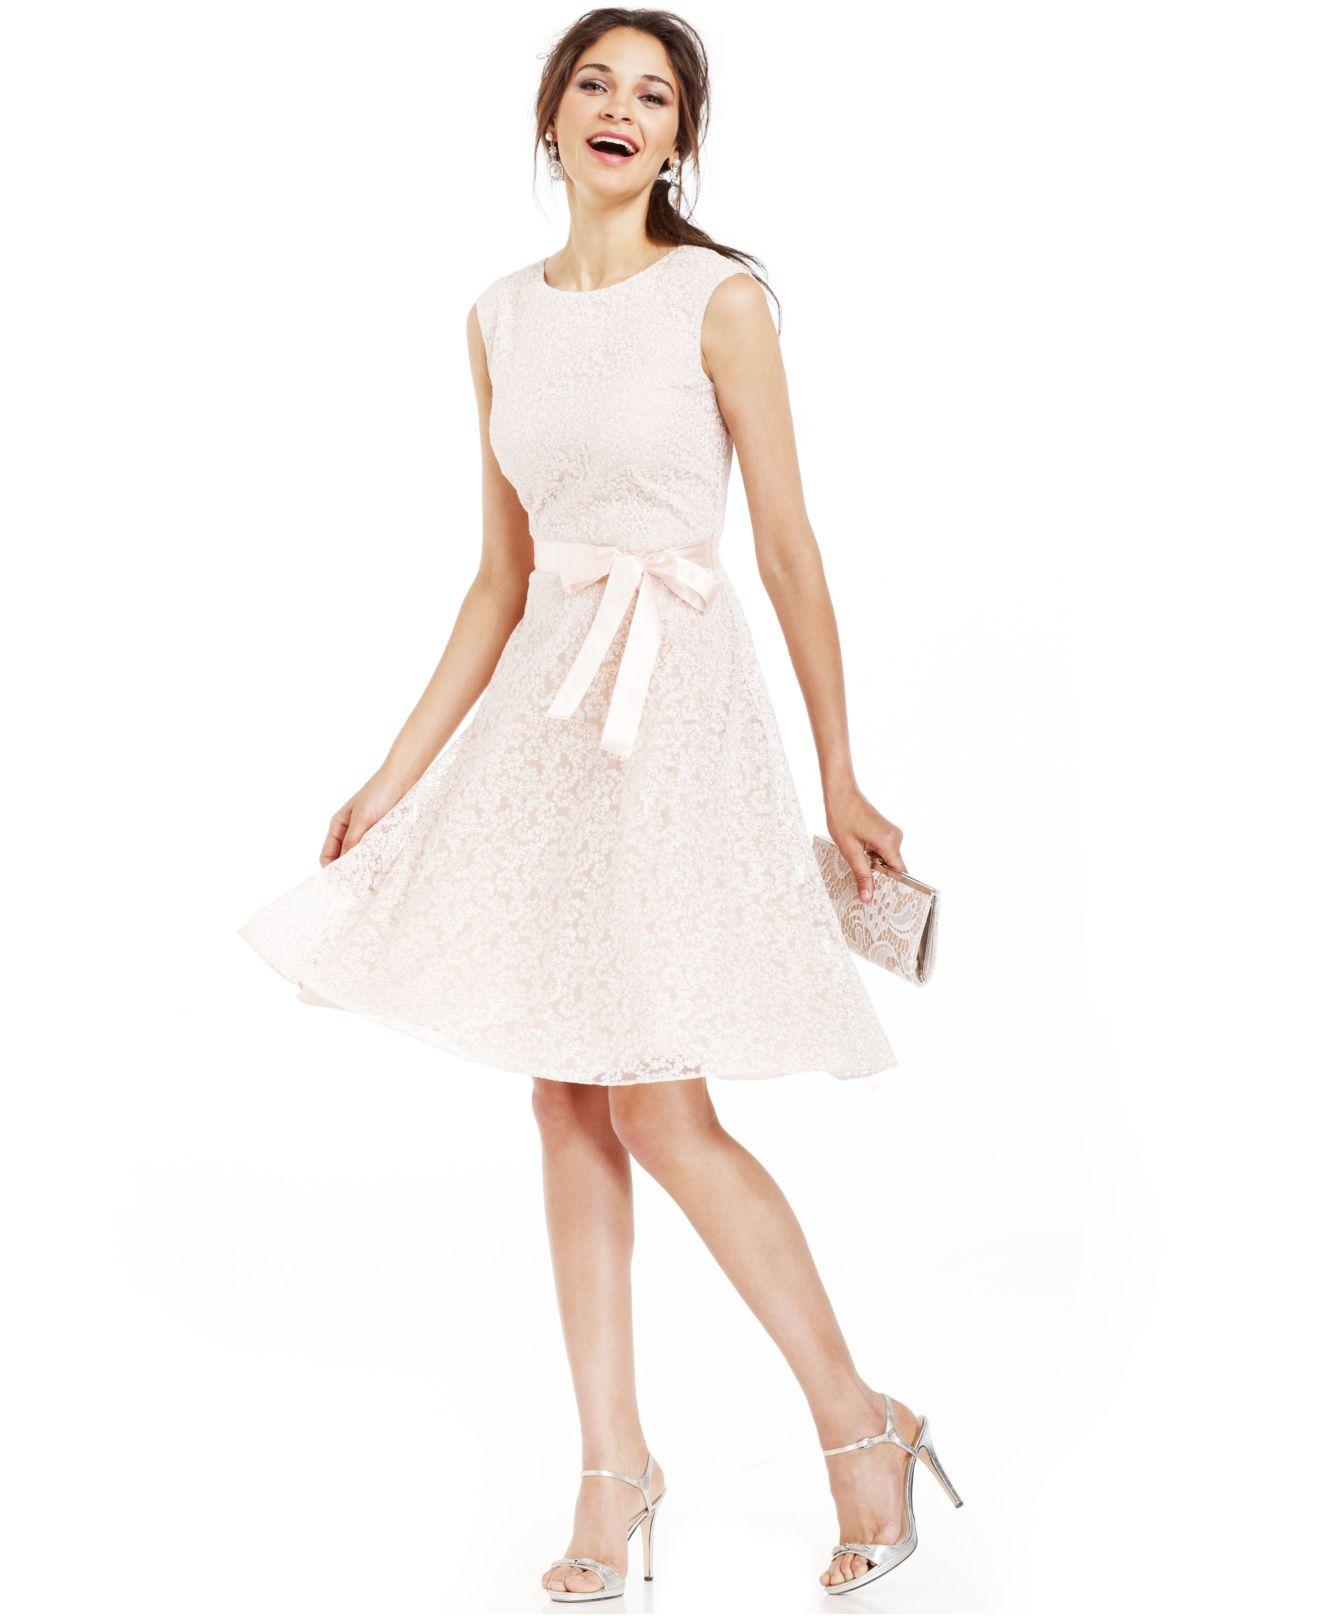 Tahari Tahari By Asl Glitter Lace Belted Dress in Natural | Lyst